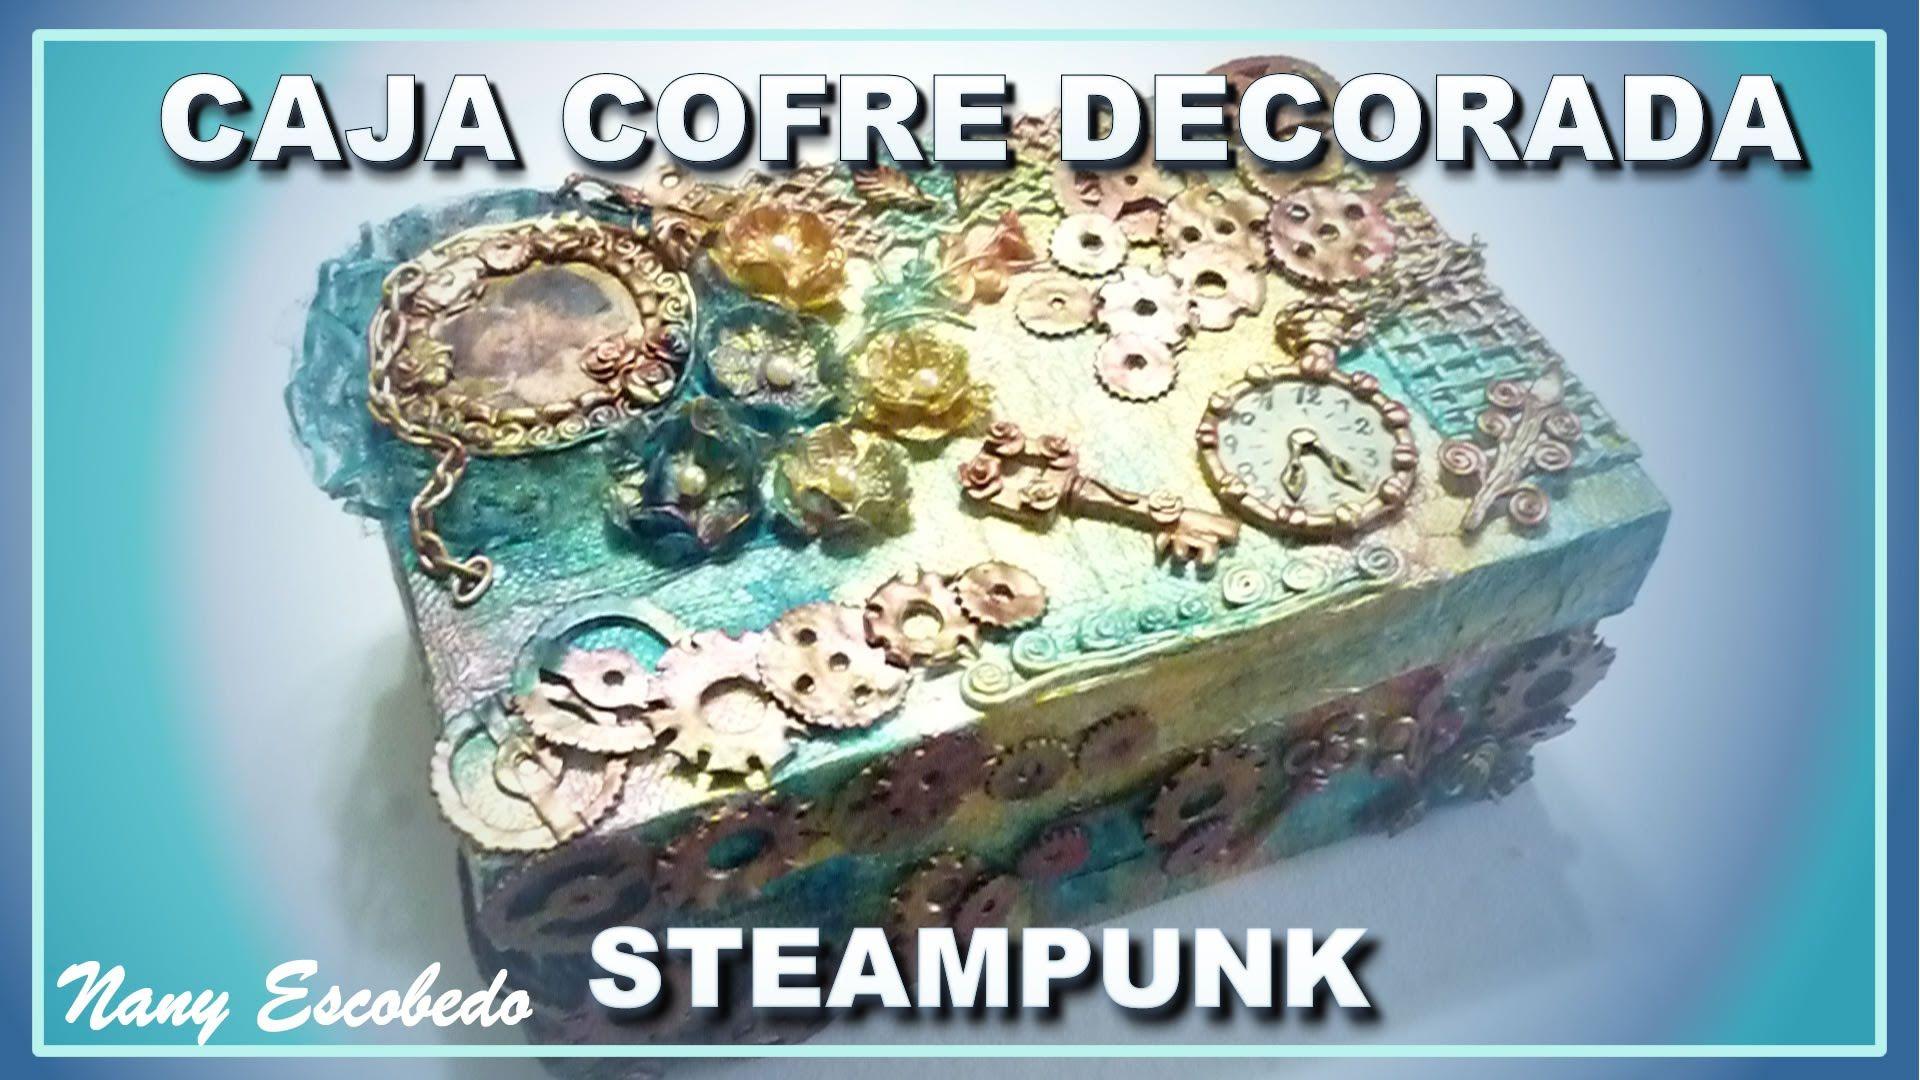 Caja cofre decorada con la t cnica steampunk - Manualidades pintar caja metal ...